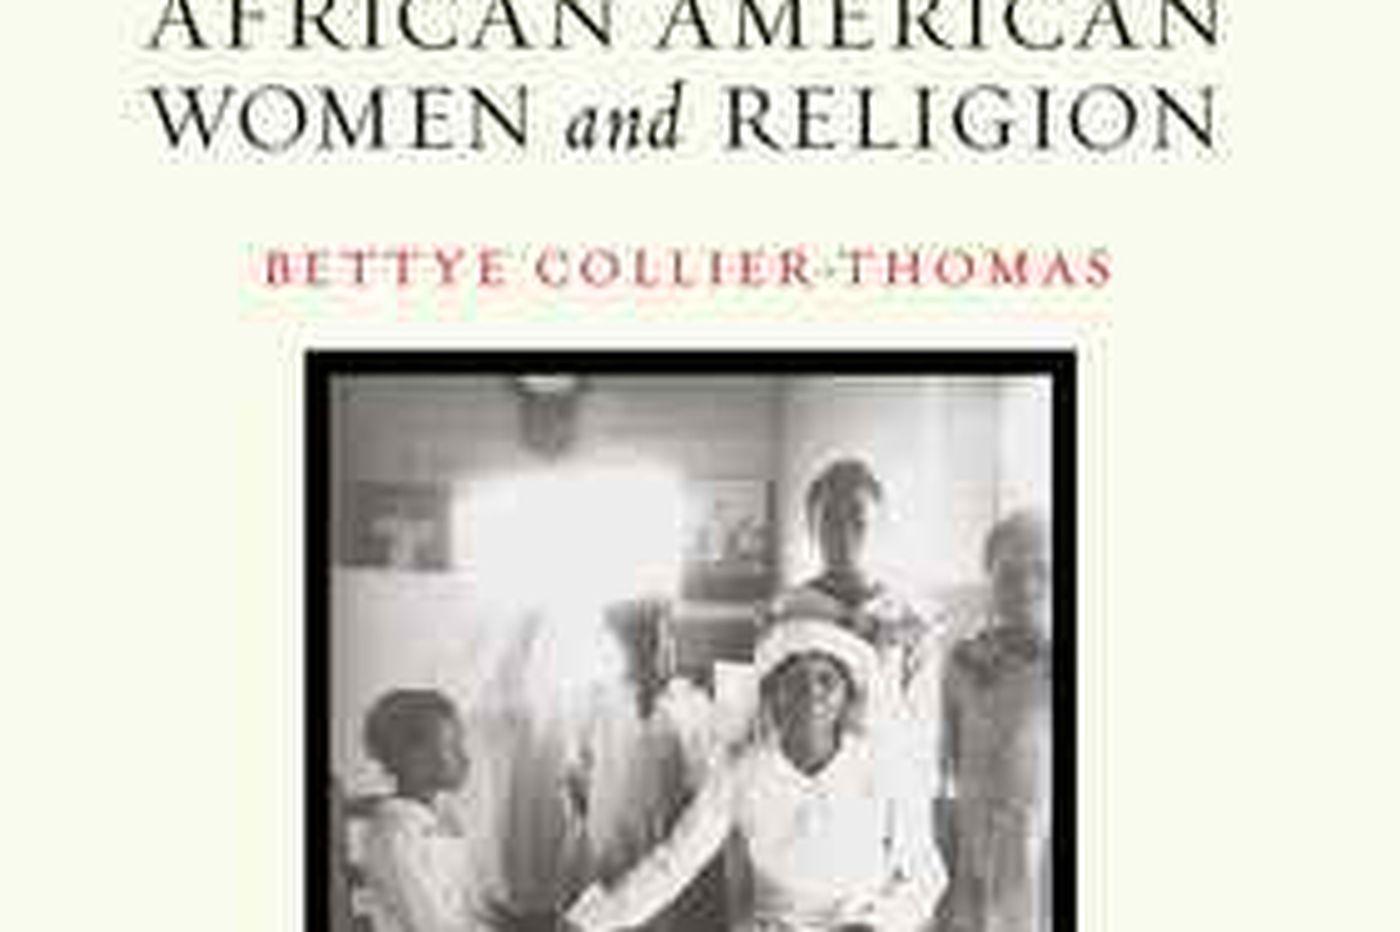 Black women's influence of faith